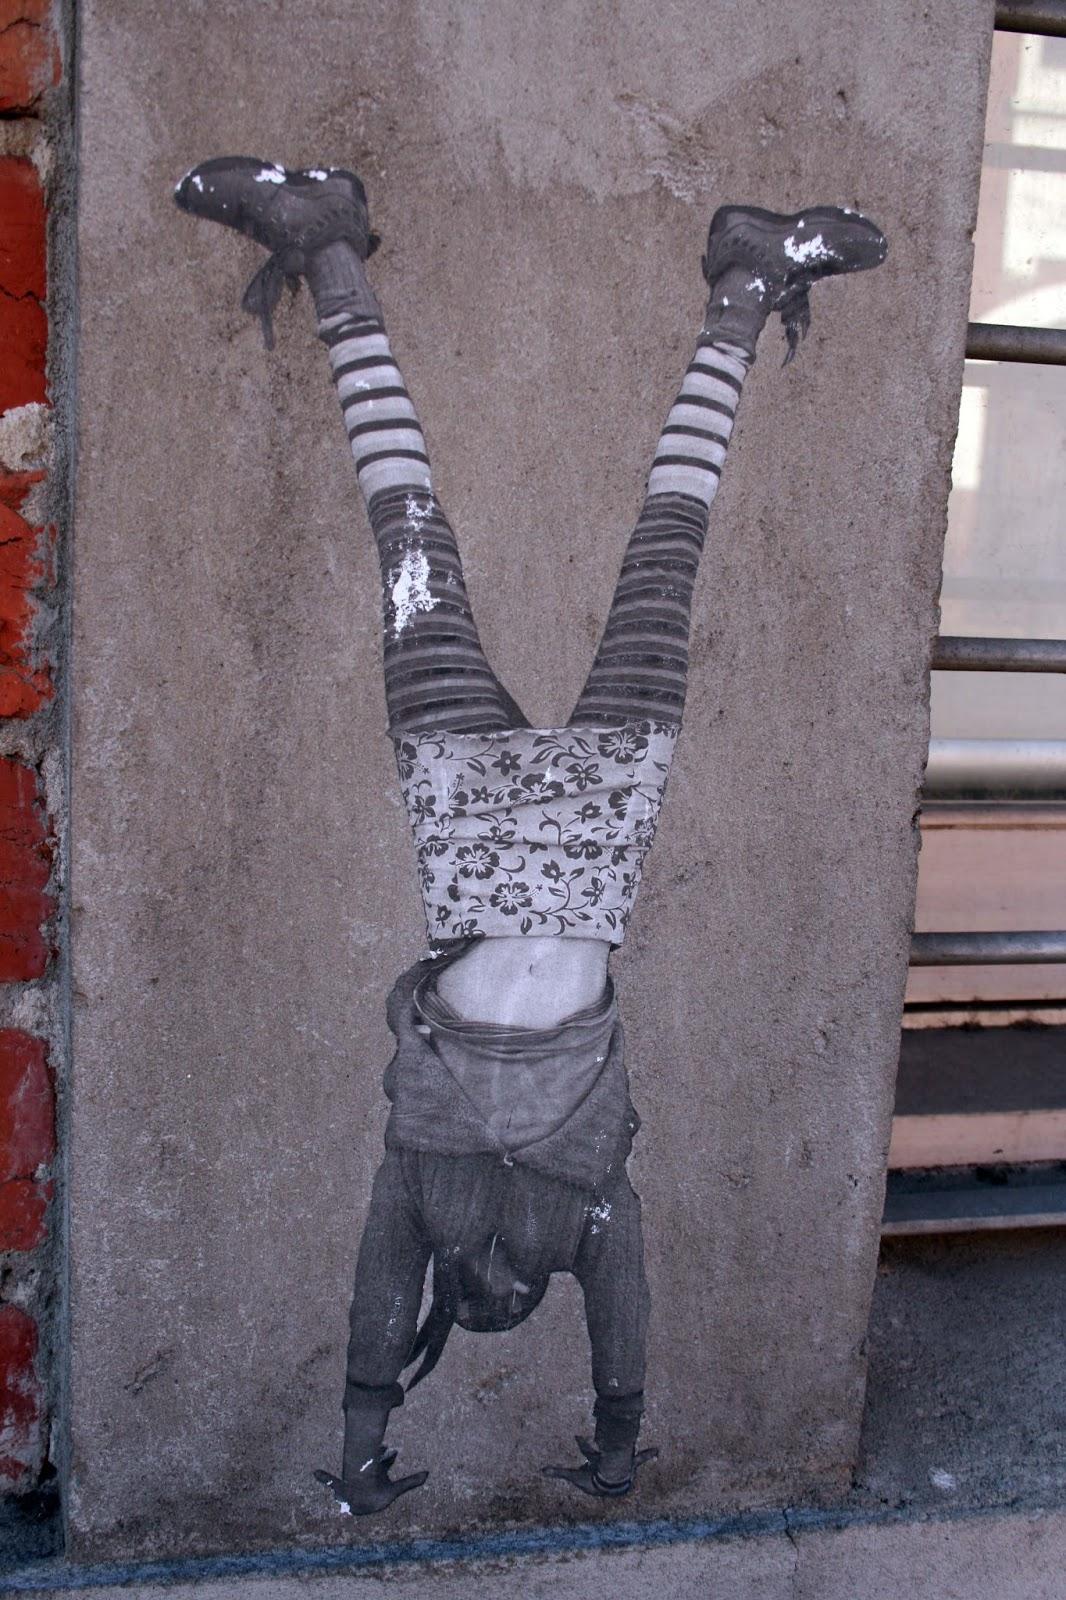 Graffitis Du Monde Street Art Street Art Melbourne 17 I Larissa Macfarlane Sugar Meggs Miya Lush Mcporter Dvate Shida Banana Peel Ritz Mayze Bmc Abyss Tenet Silk Junky